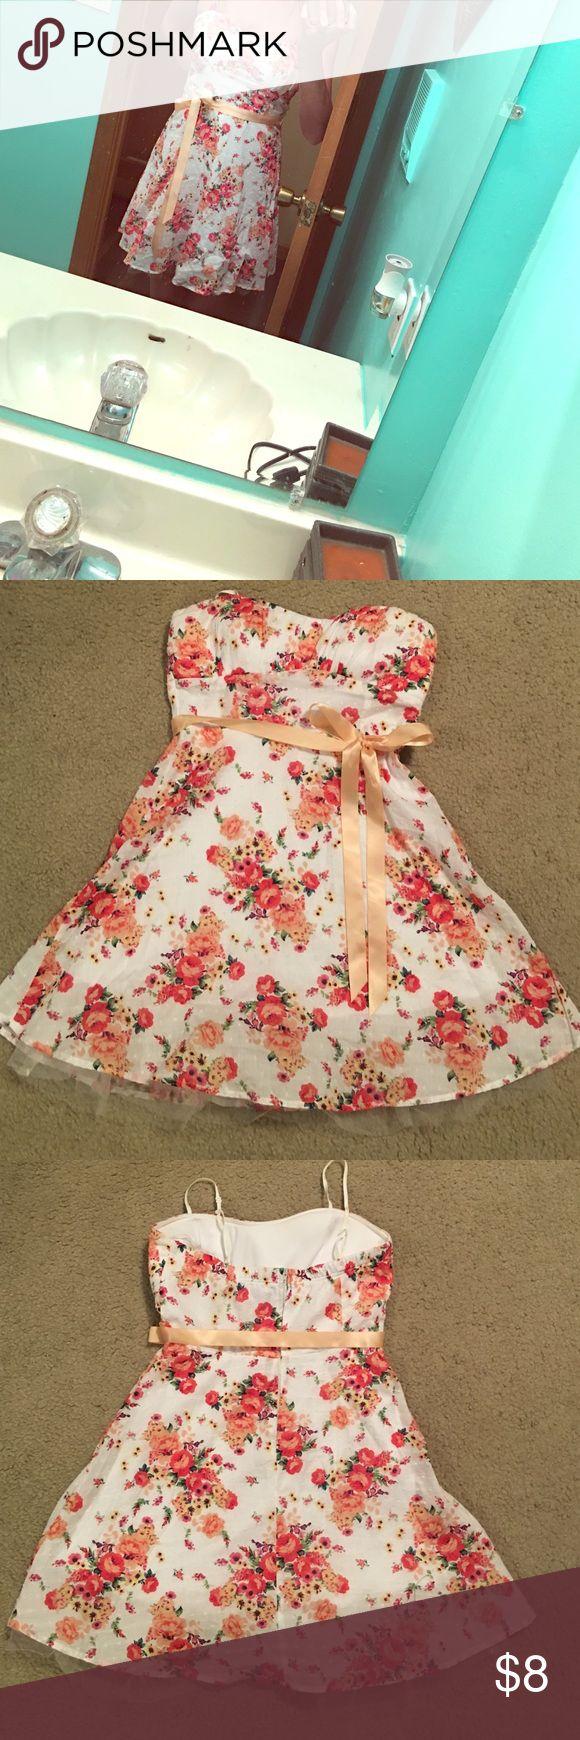 Floral dress Short floral dress worn once to a wedding Rue 21 Dresses Mini